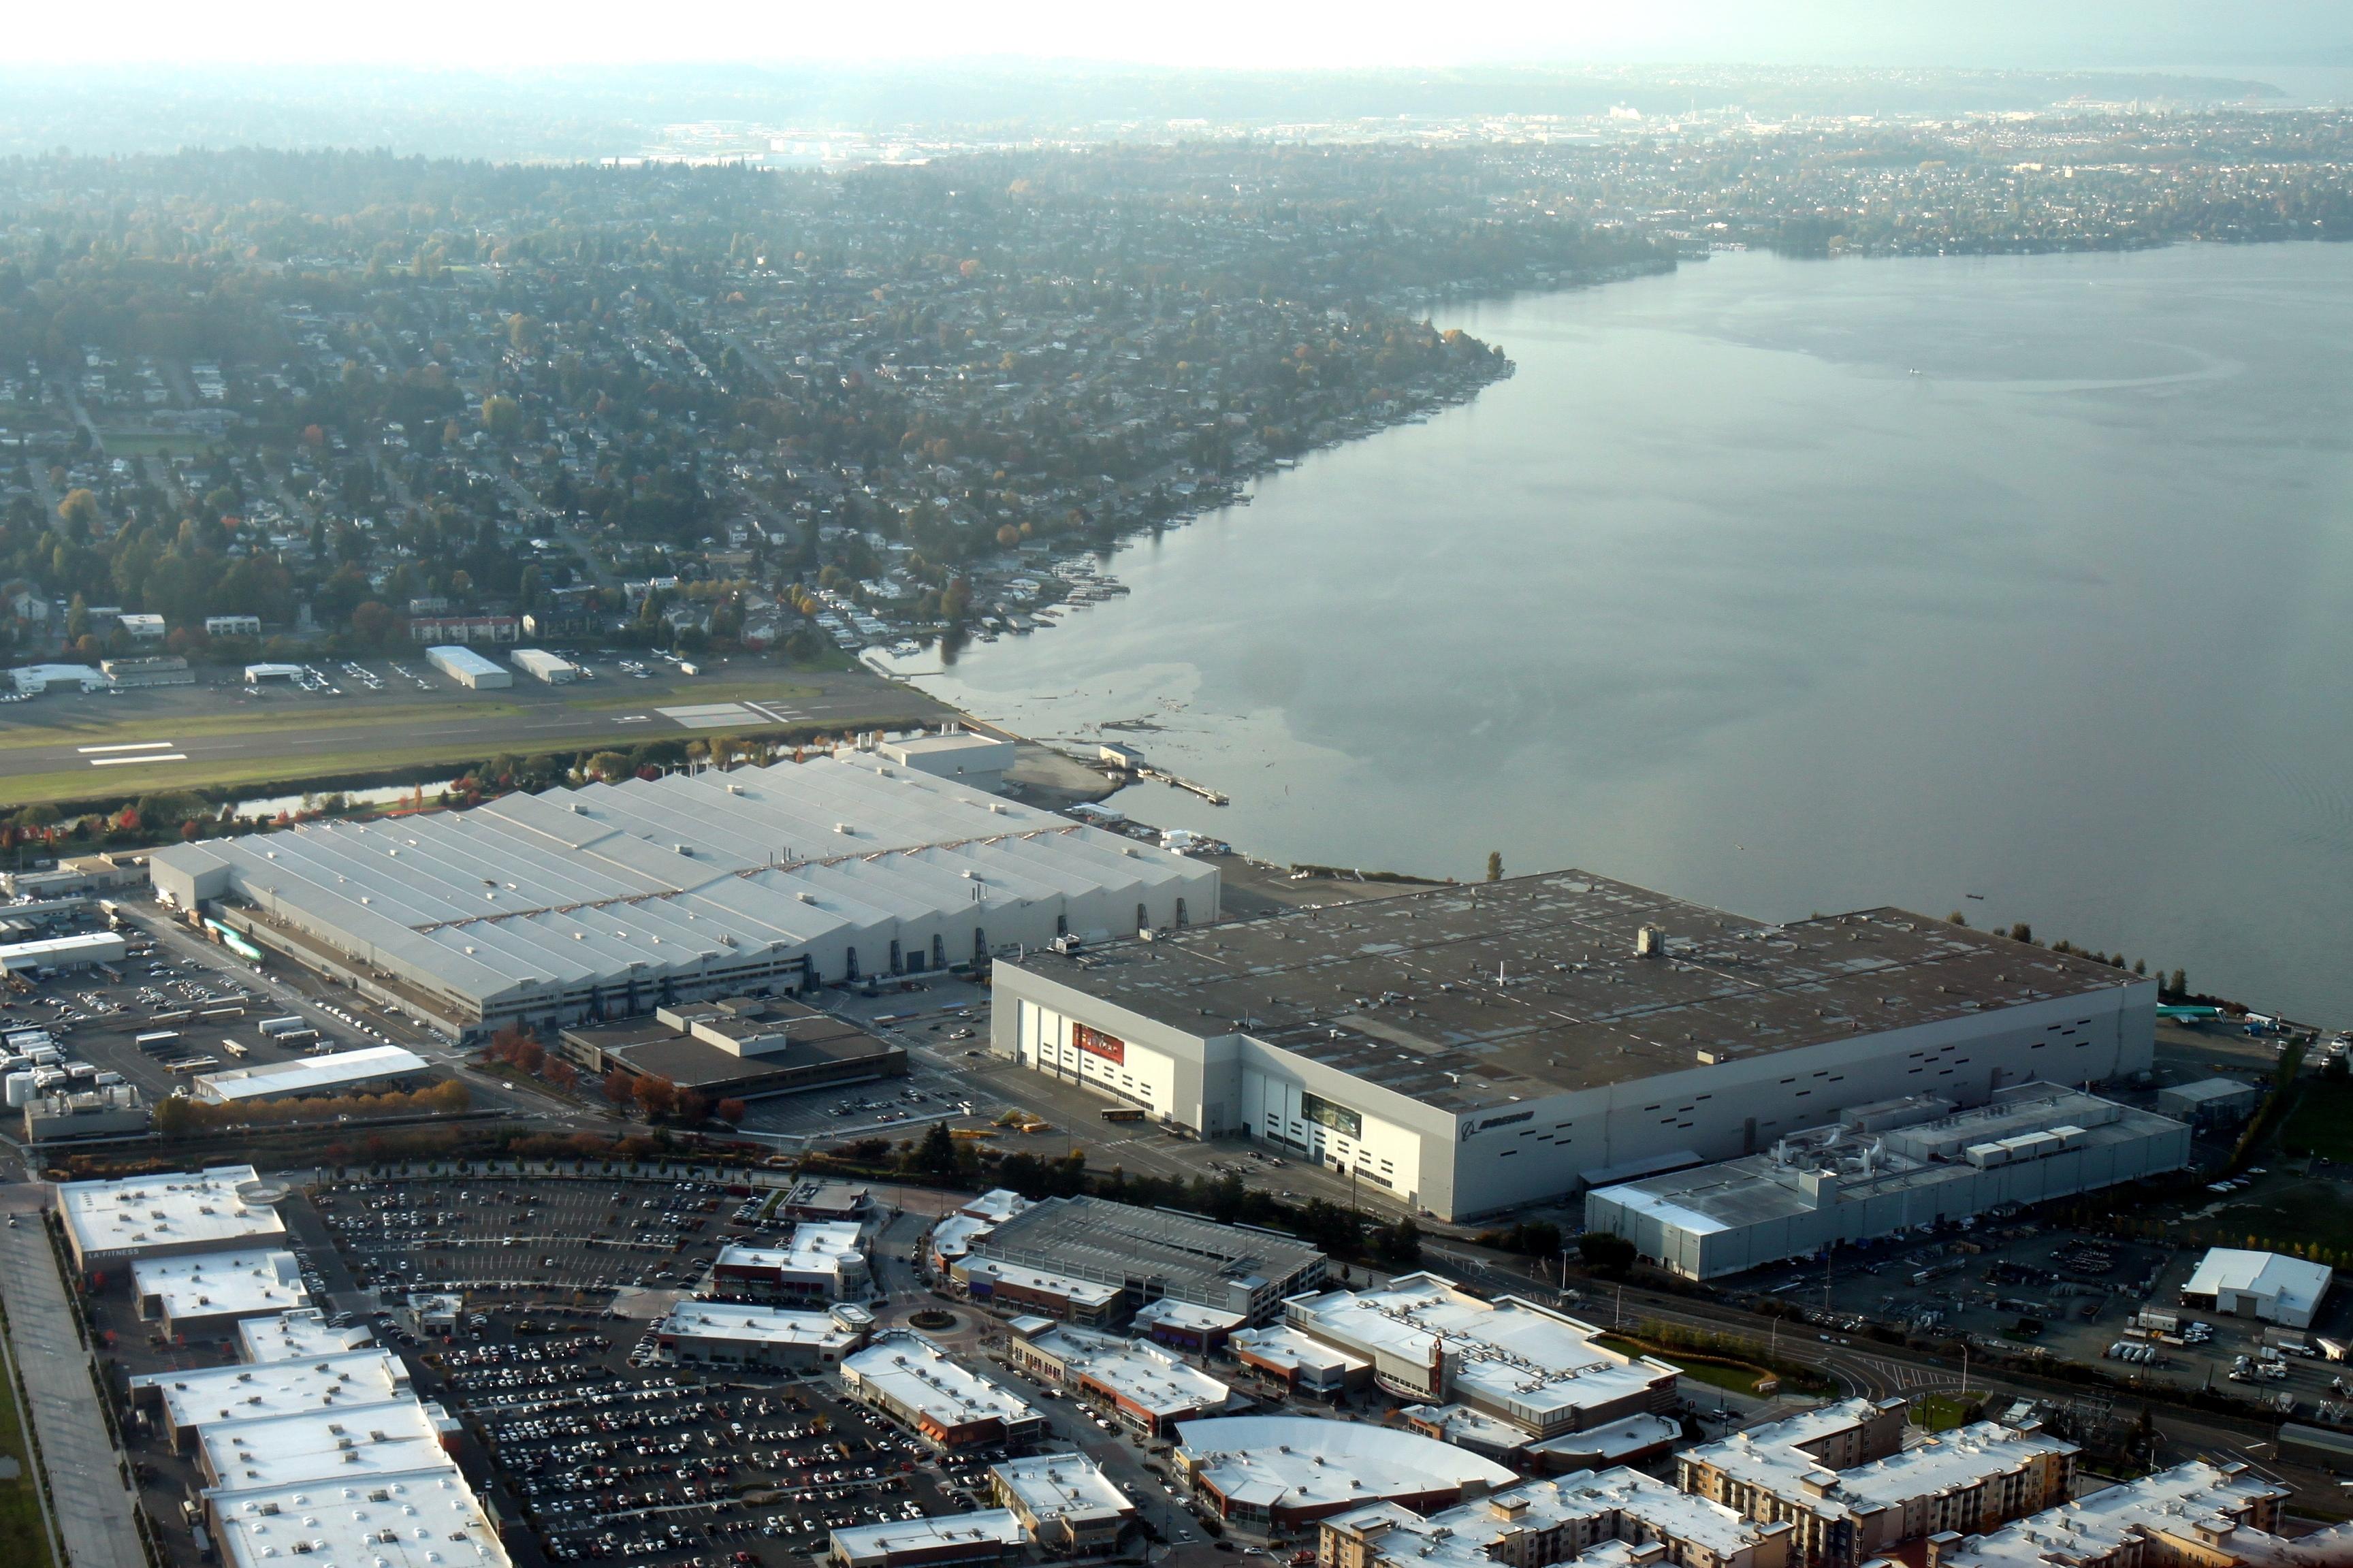 Boeing Renton Factory - Wikipedia throughout Boeing Renton Facility Map